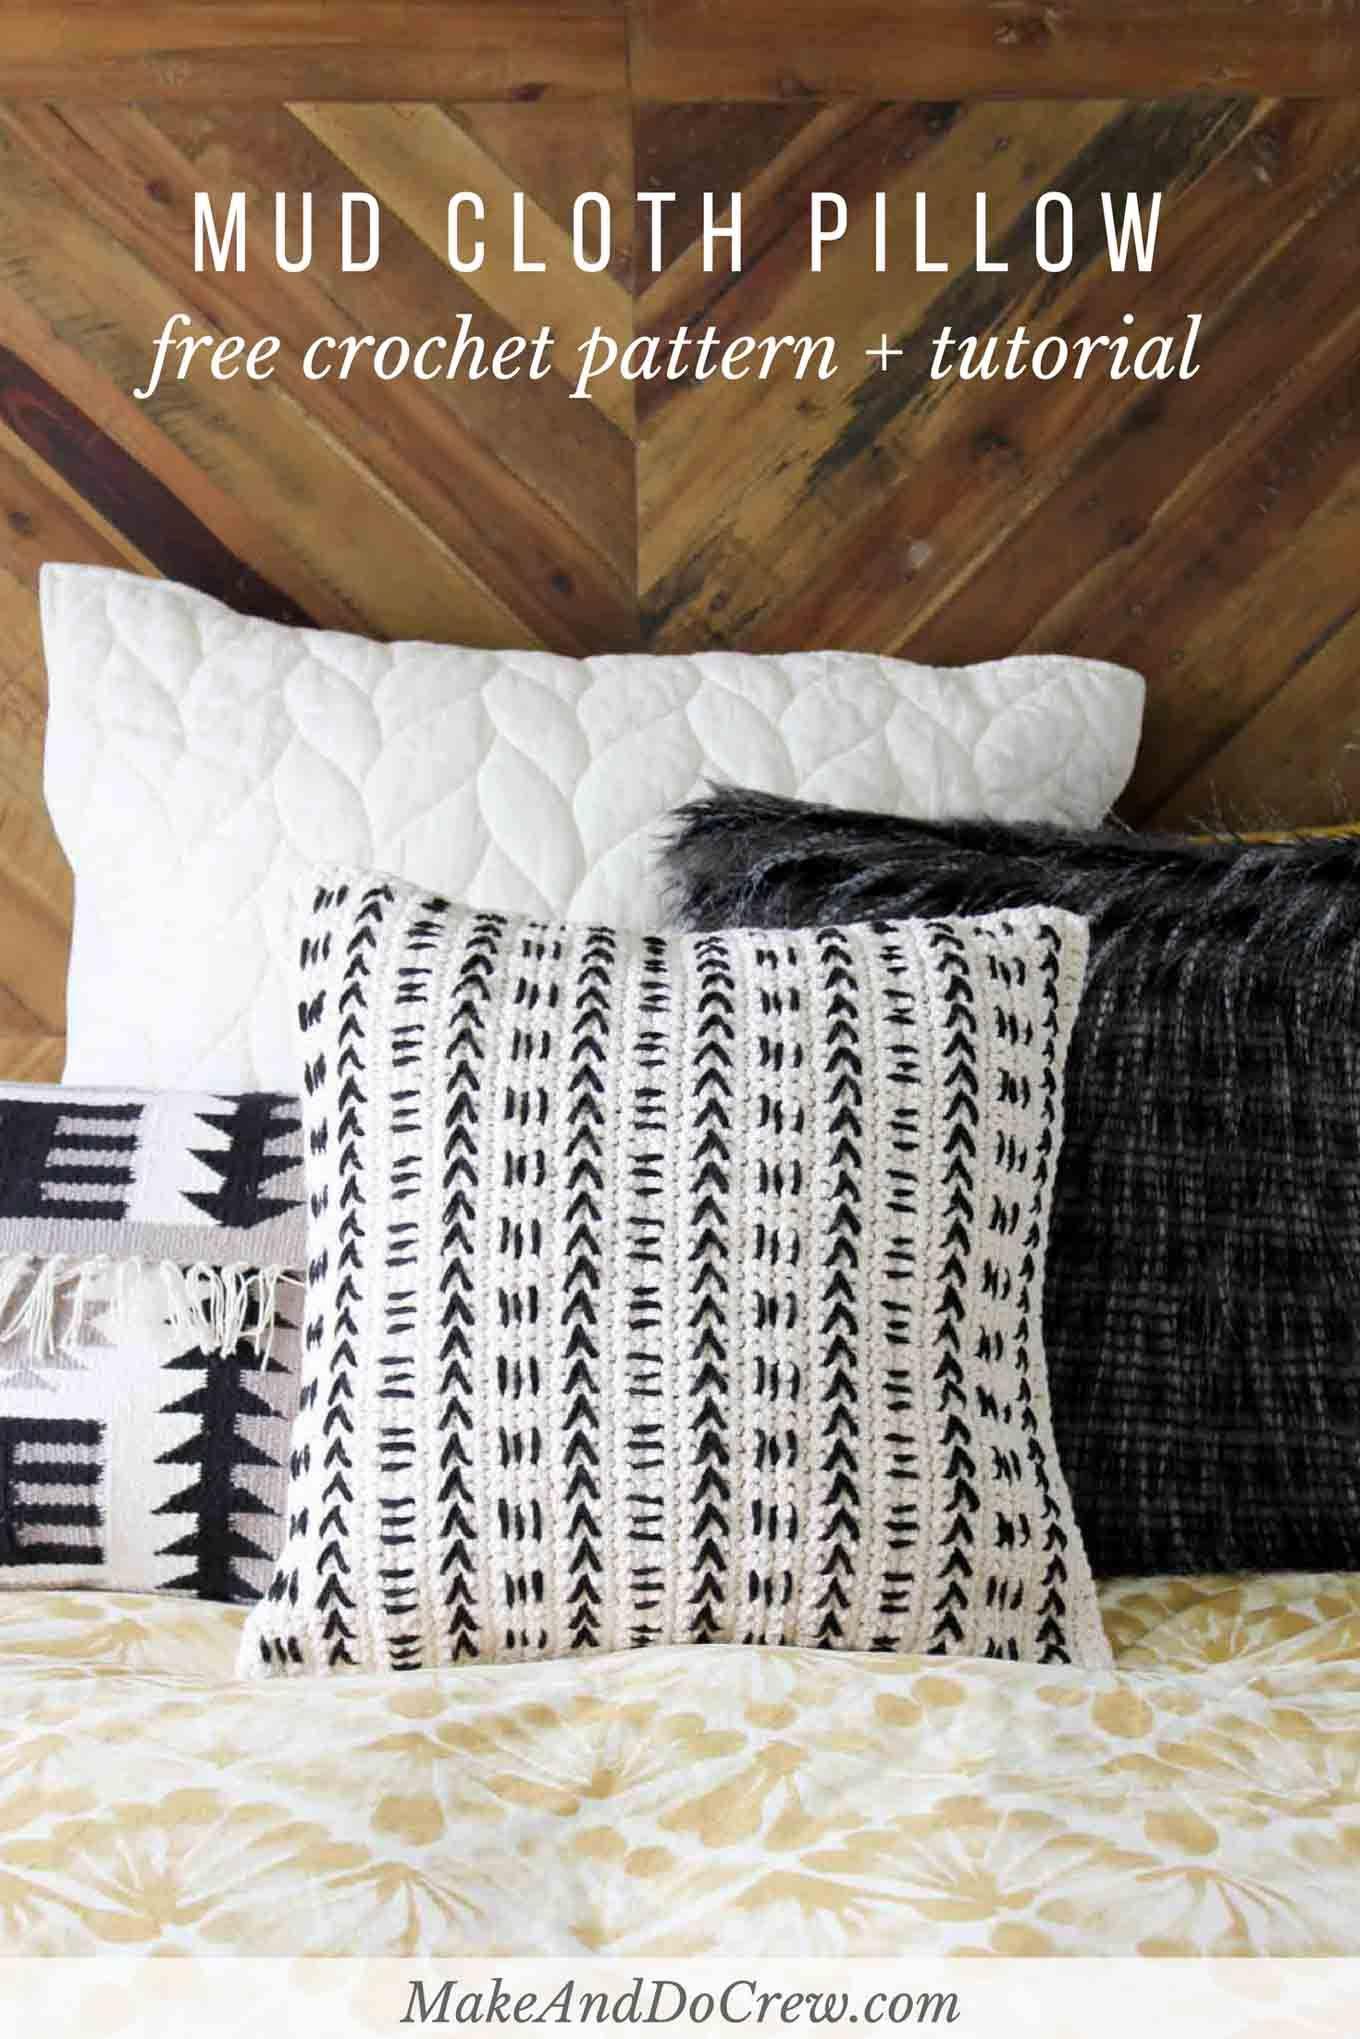 mud cloth crochet pillow pattern free pattern crochet crochet rh pinterest com